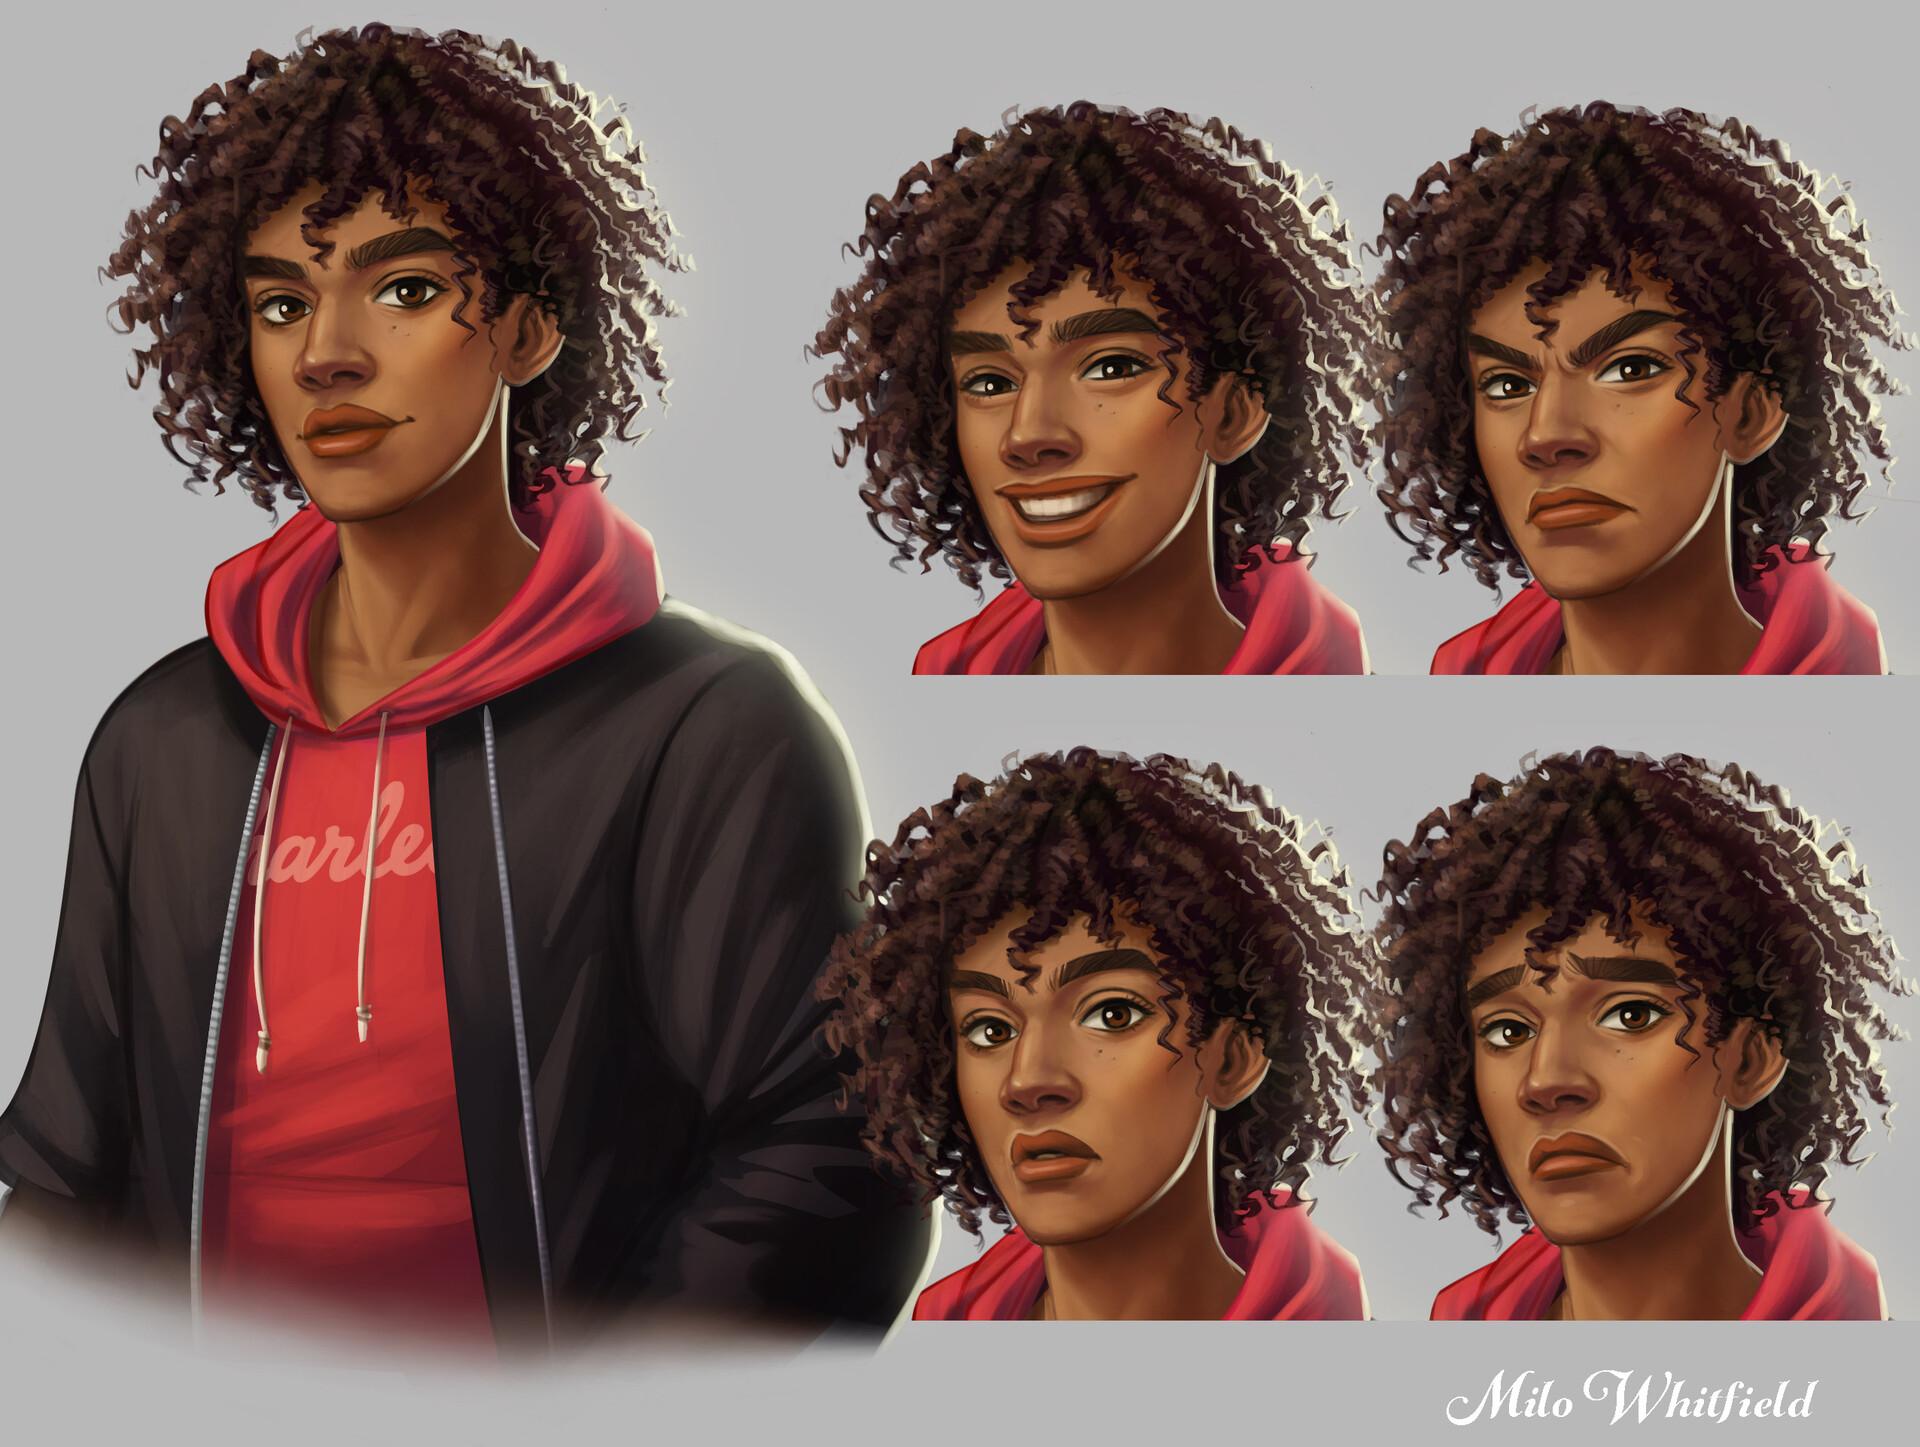 Character Art: Milo